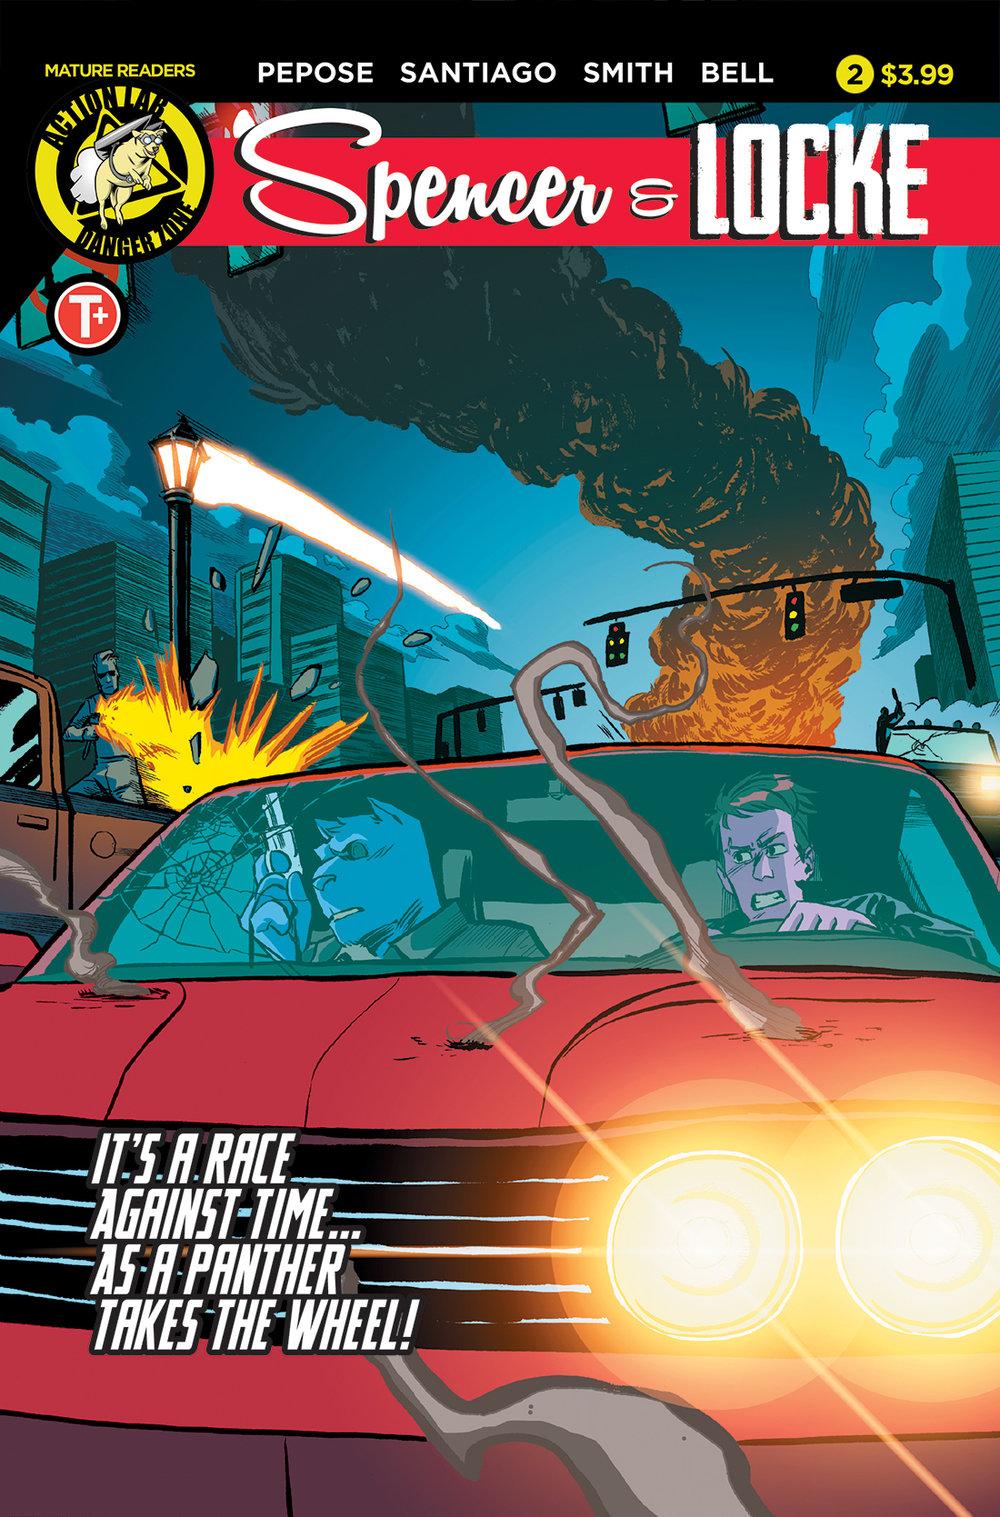 Spencer & Locke #2 Cover A (Jorge Santiago MAIN).jpg